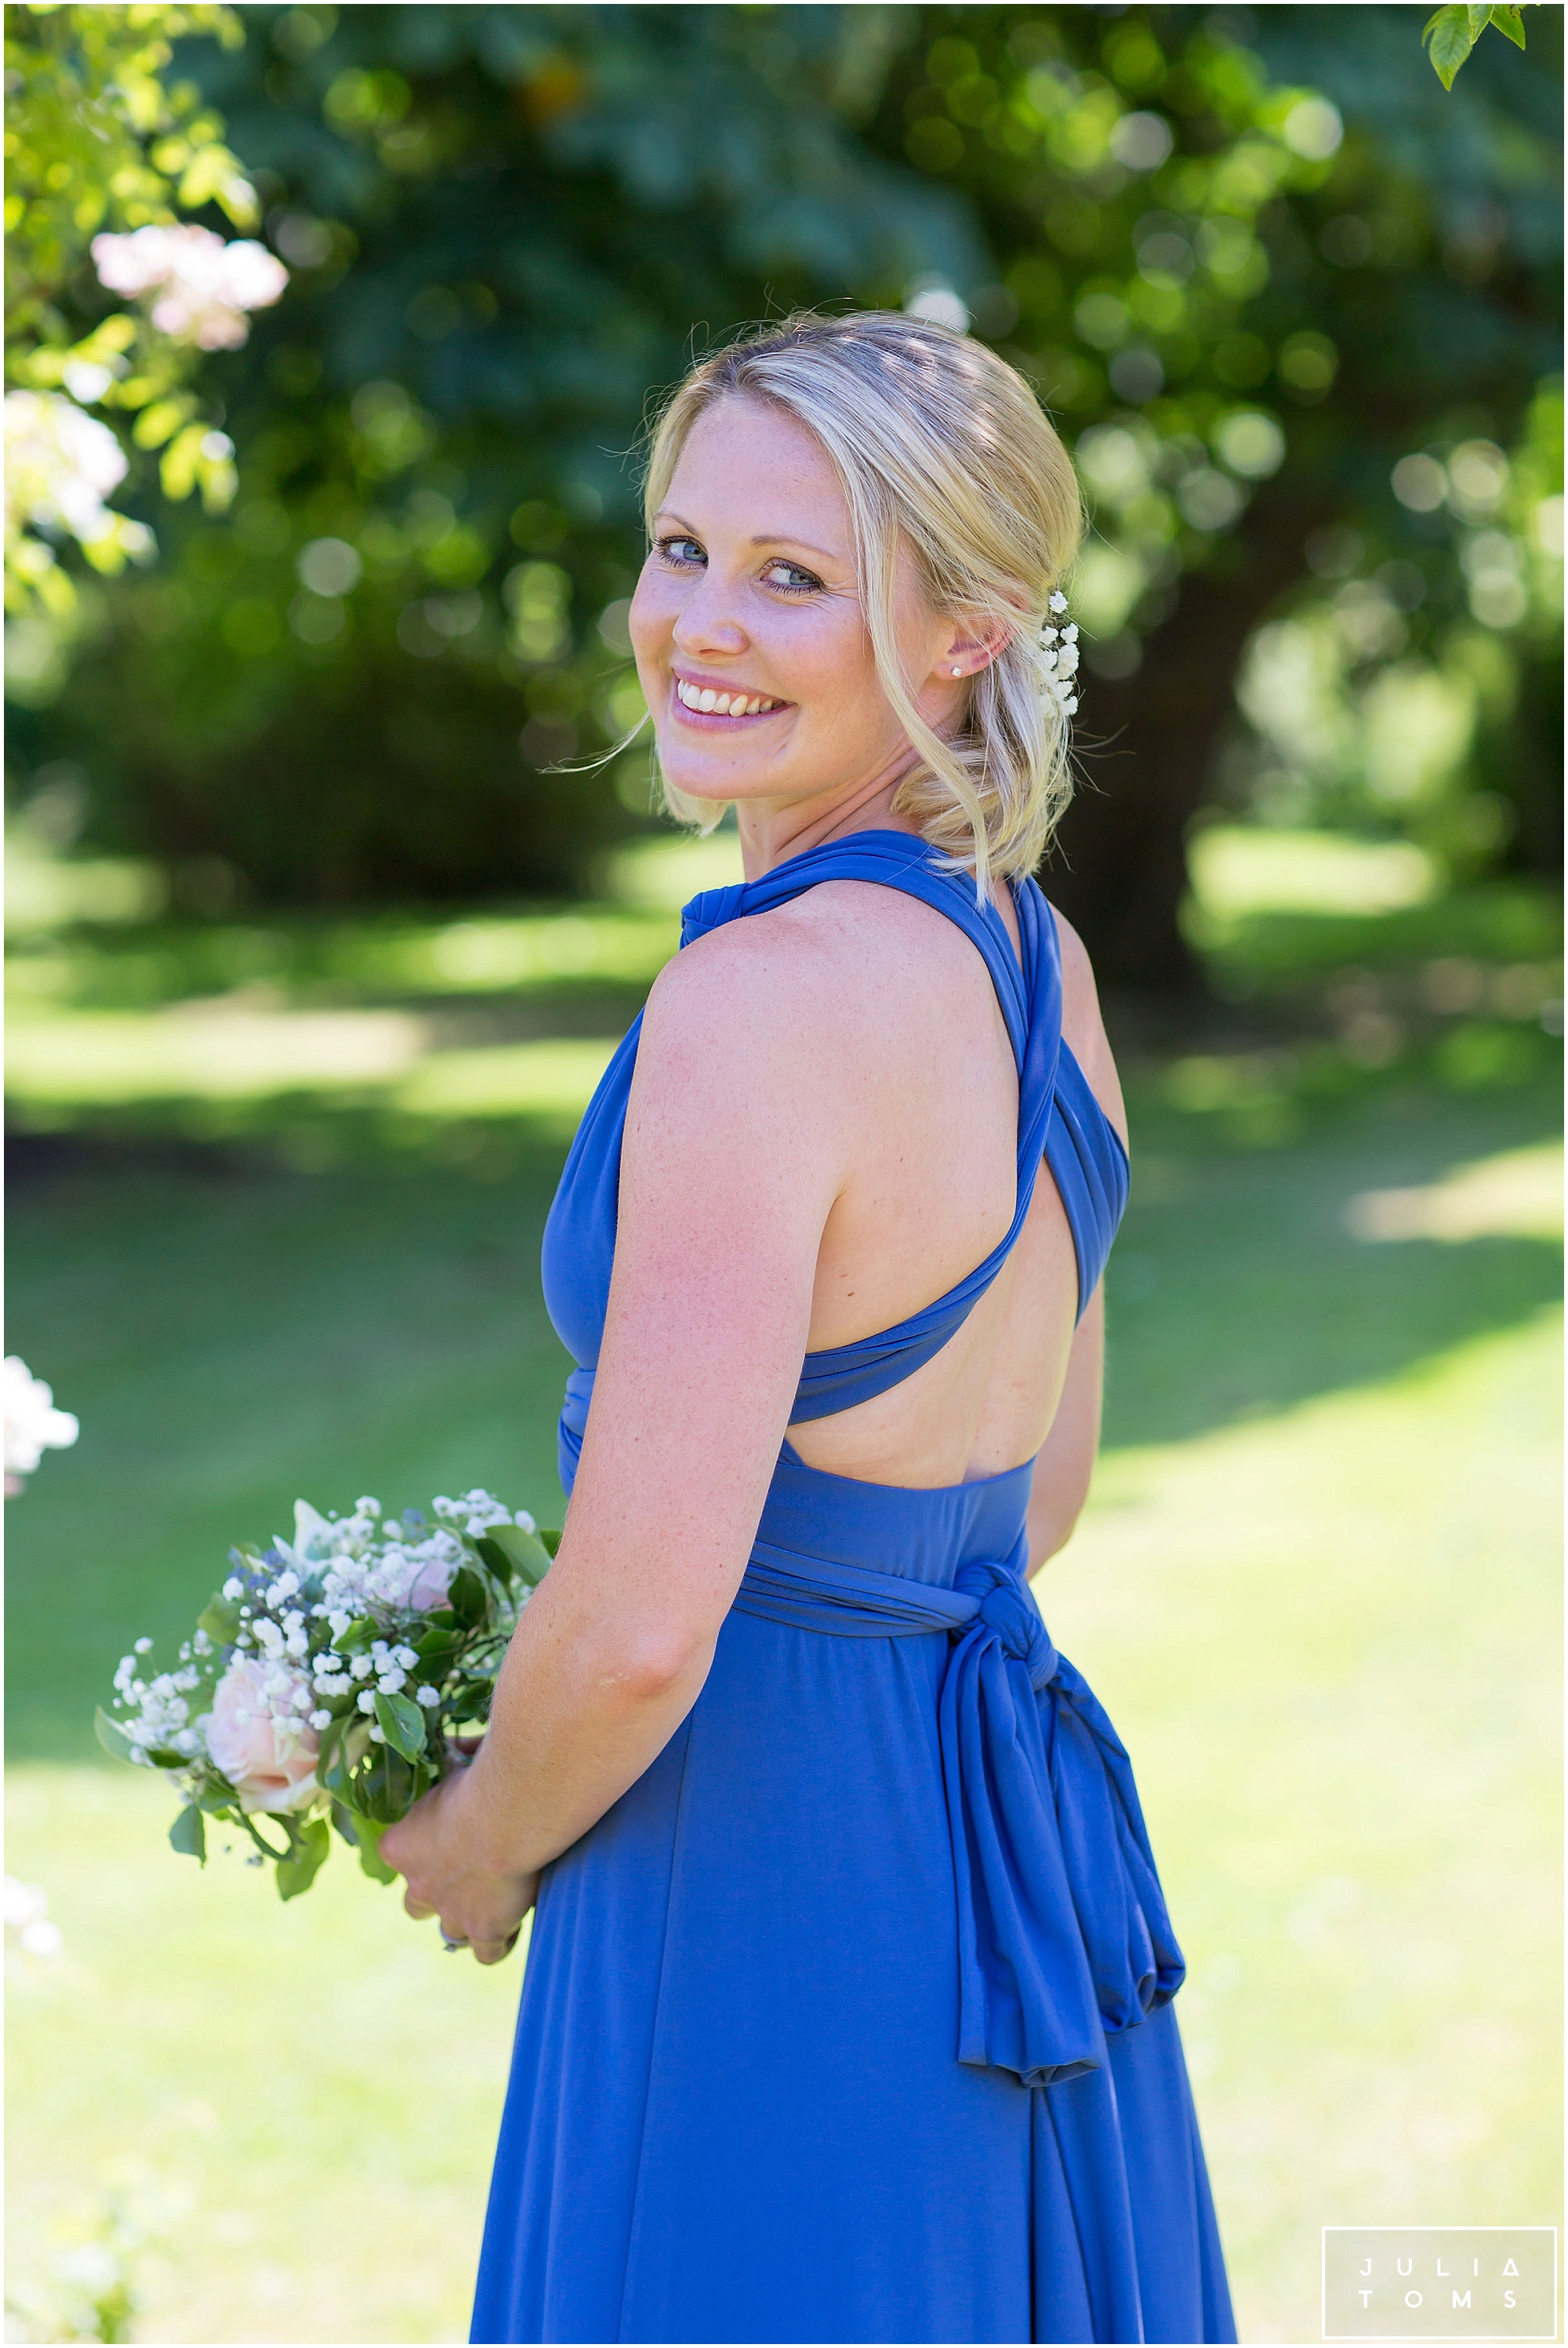 julia_toms_chichester_wedding_photographer_portsmouth_011.jpg